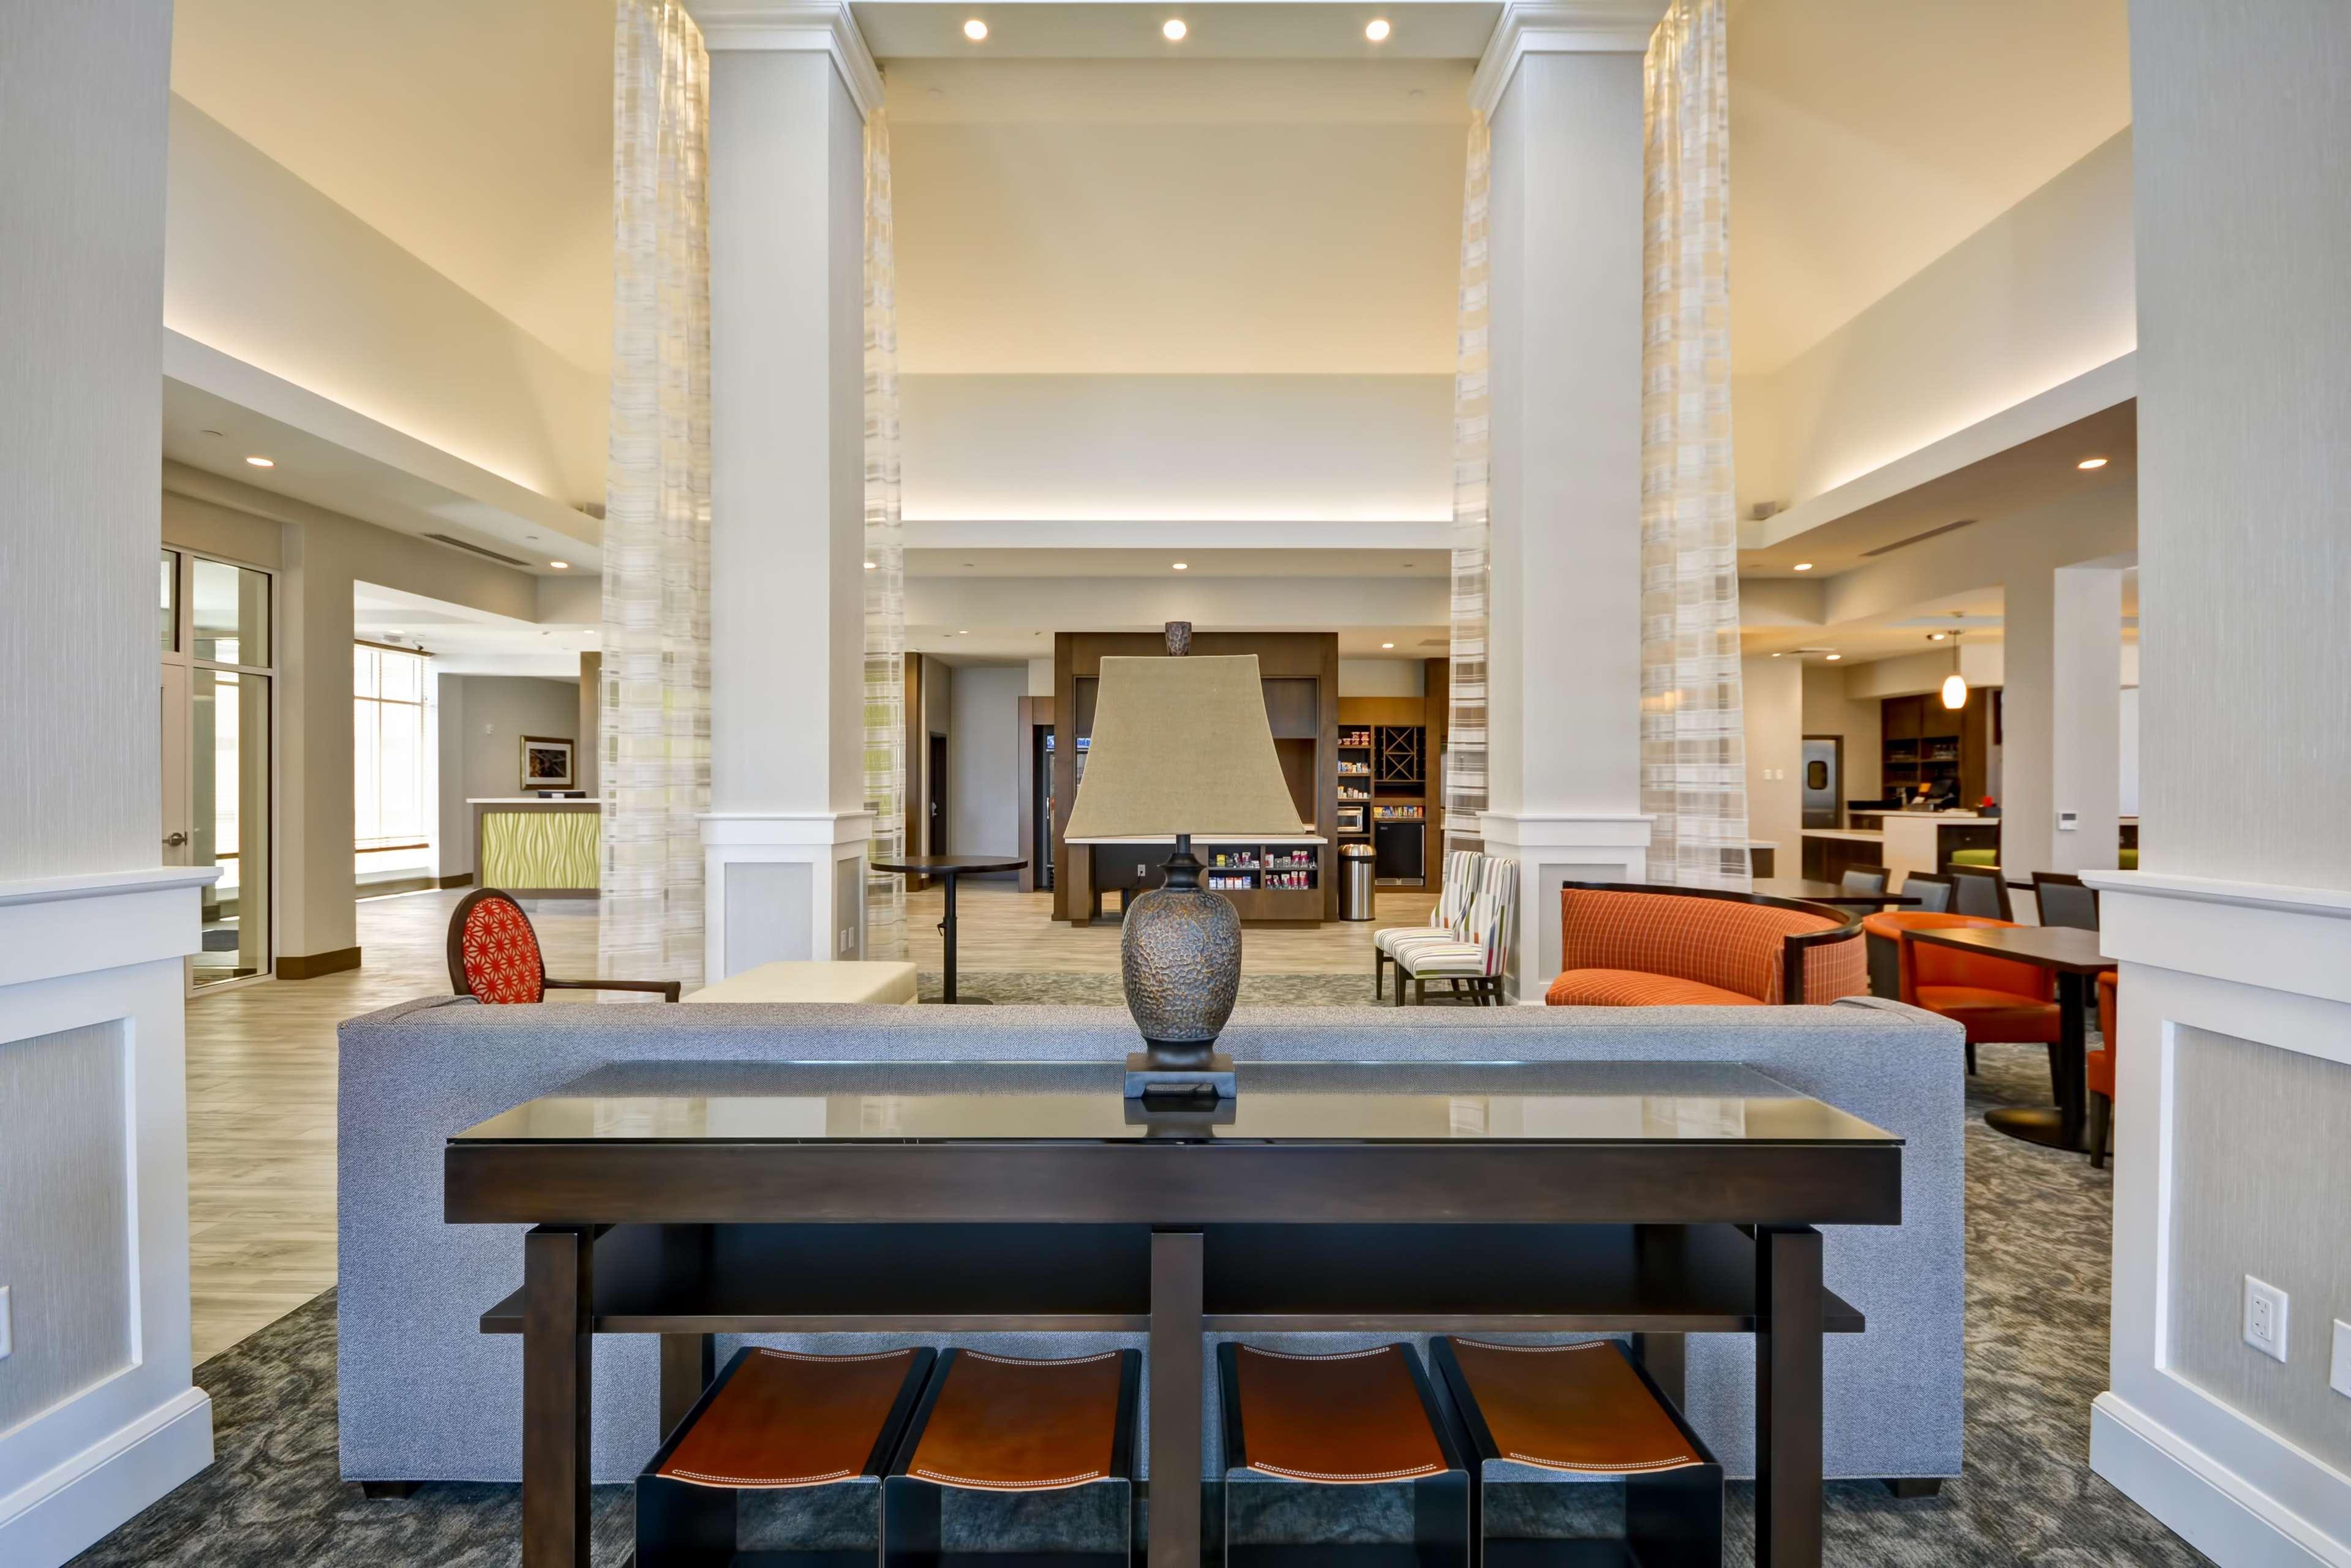 Hilton Garden Inn Phoenix/Tempe ASU Area image 7